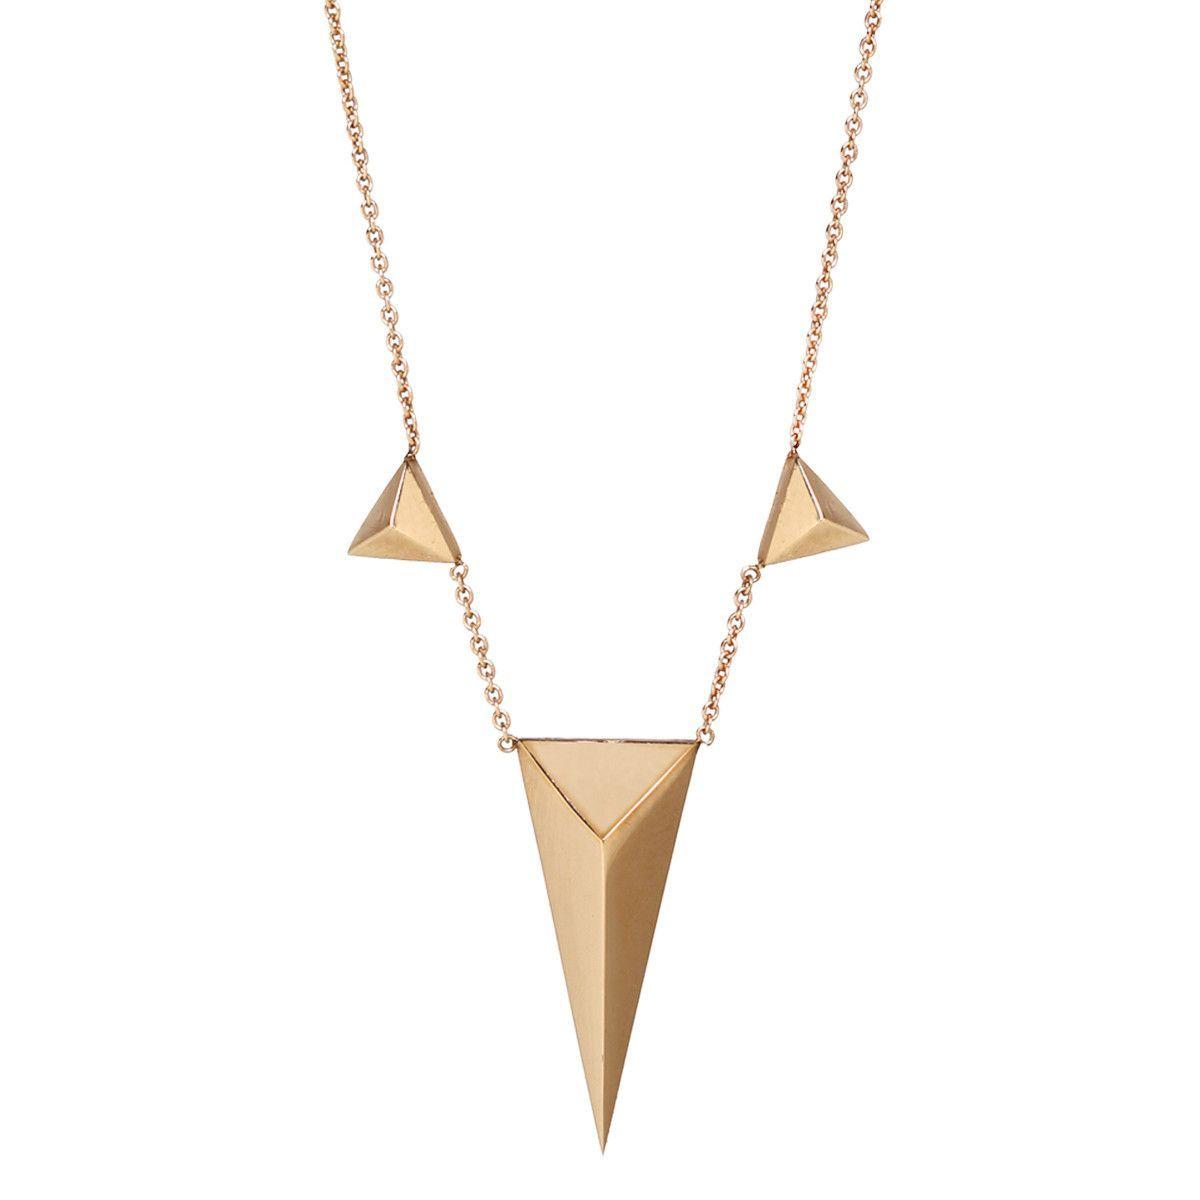 14k multi-triangle pyramids necklace